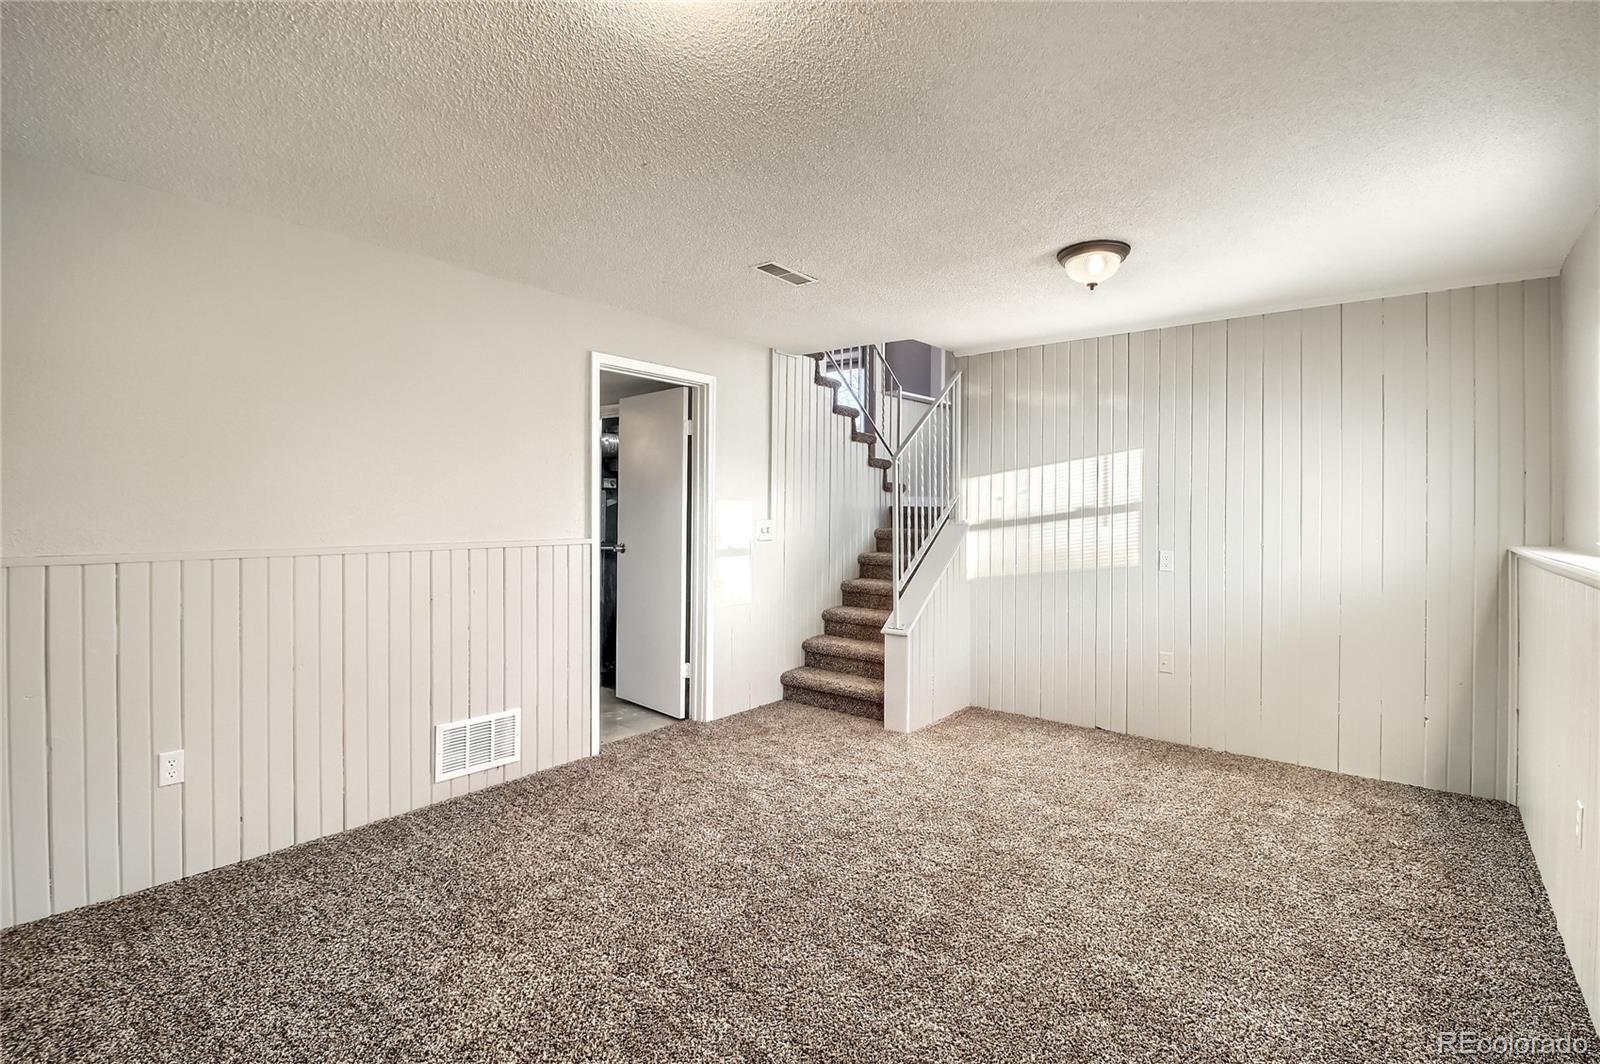 MLS# 8804701 - 27 - 20615 E Coolidge Place, Aurora, CO 80011